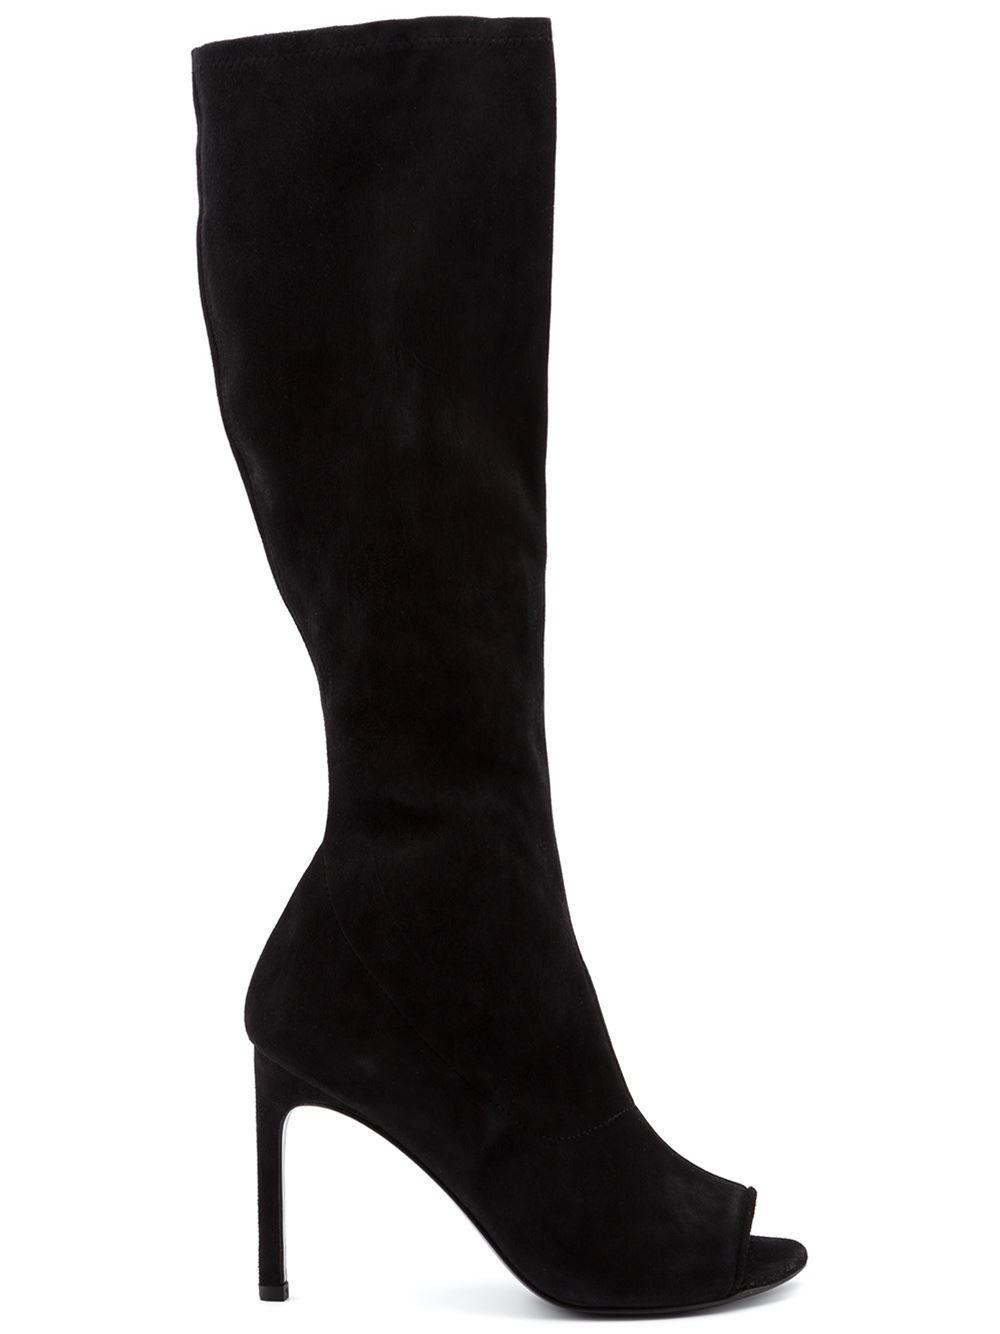 stuart weitzman peep toe knee high boots in black lyst